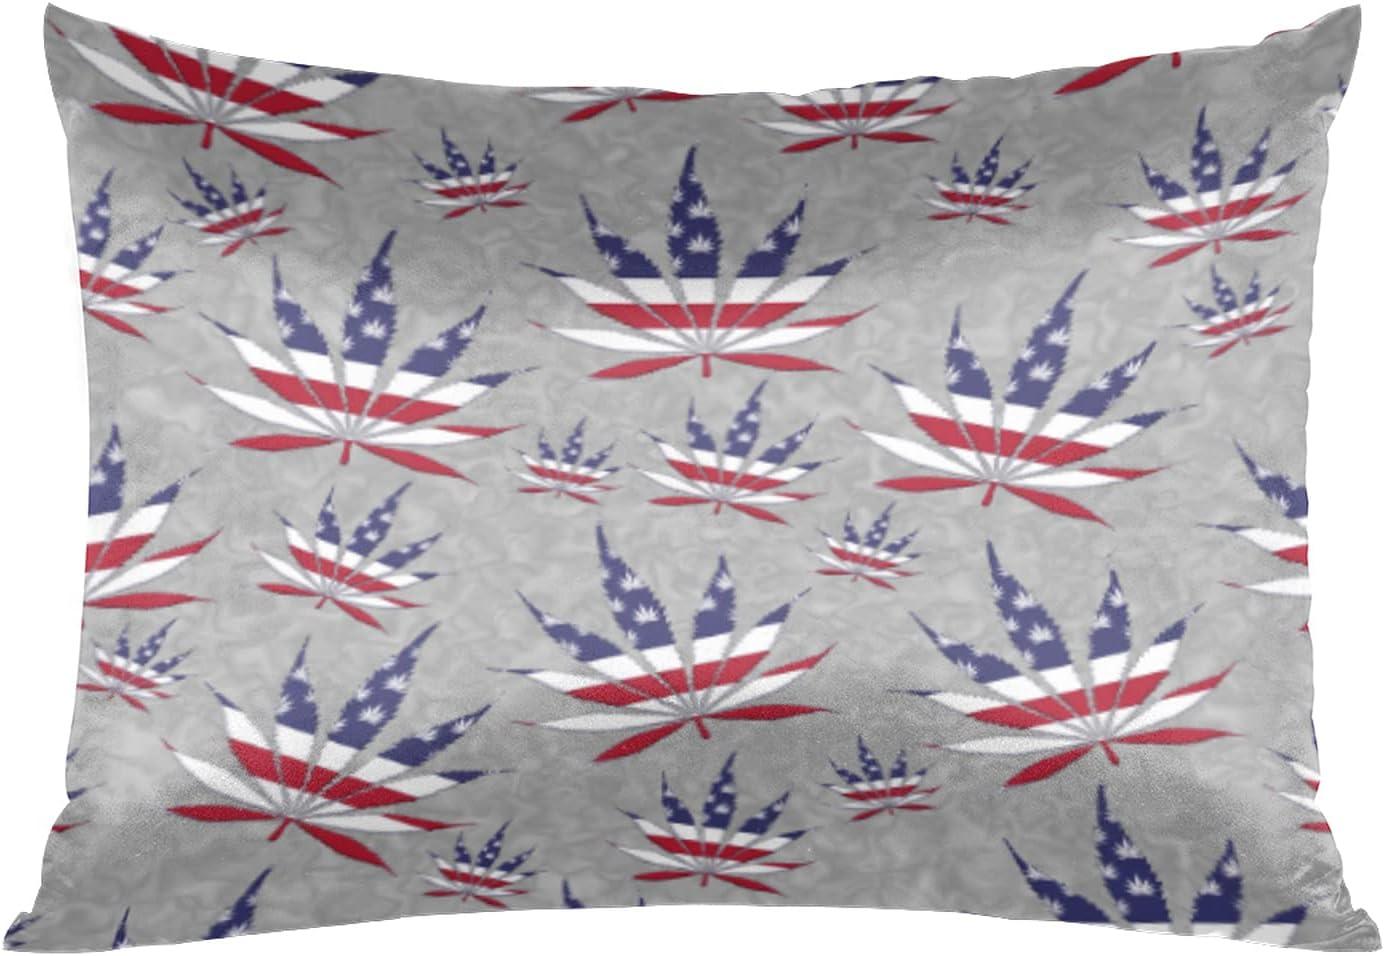 Satin Pillowcase for Hair and Skin Silk Pillow Ca High Cheap SALE Start material Marijuana Leaf